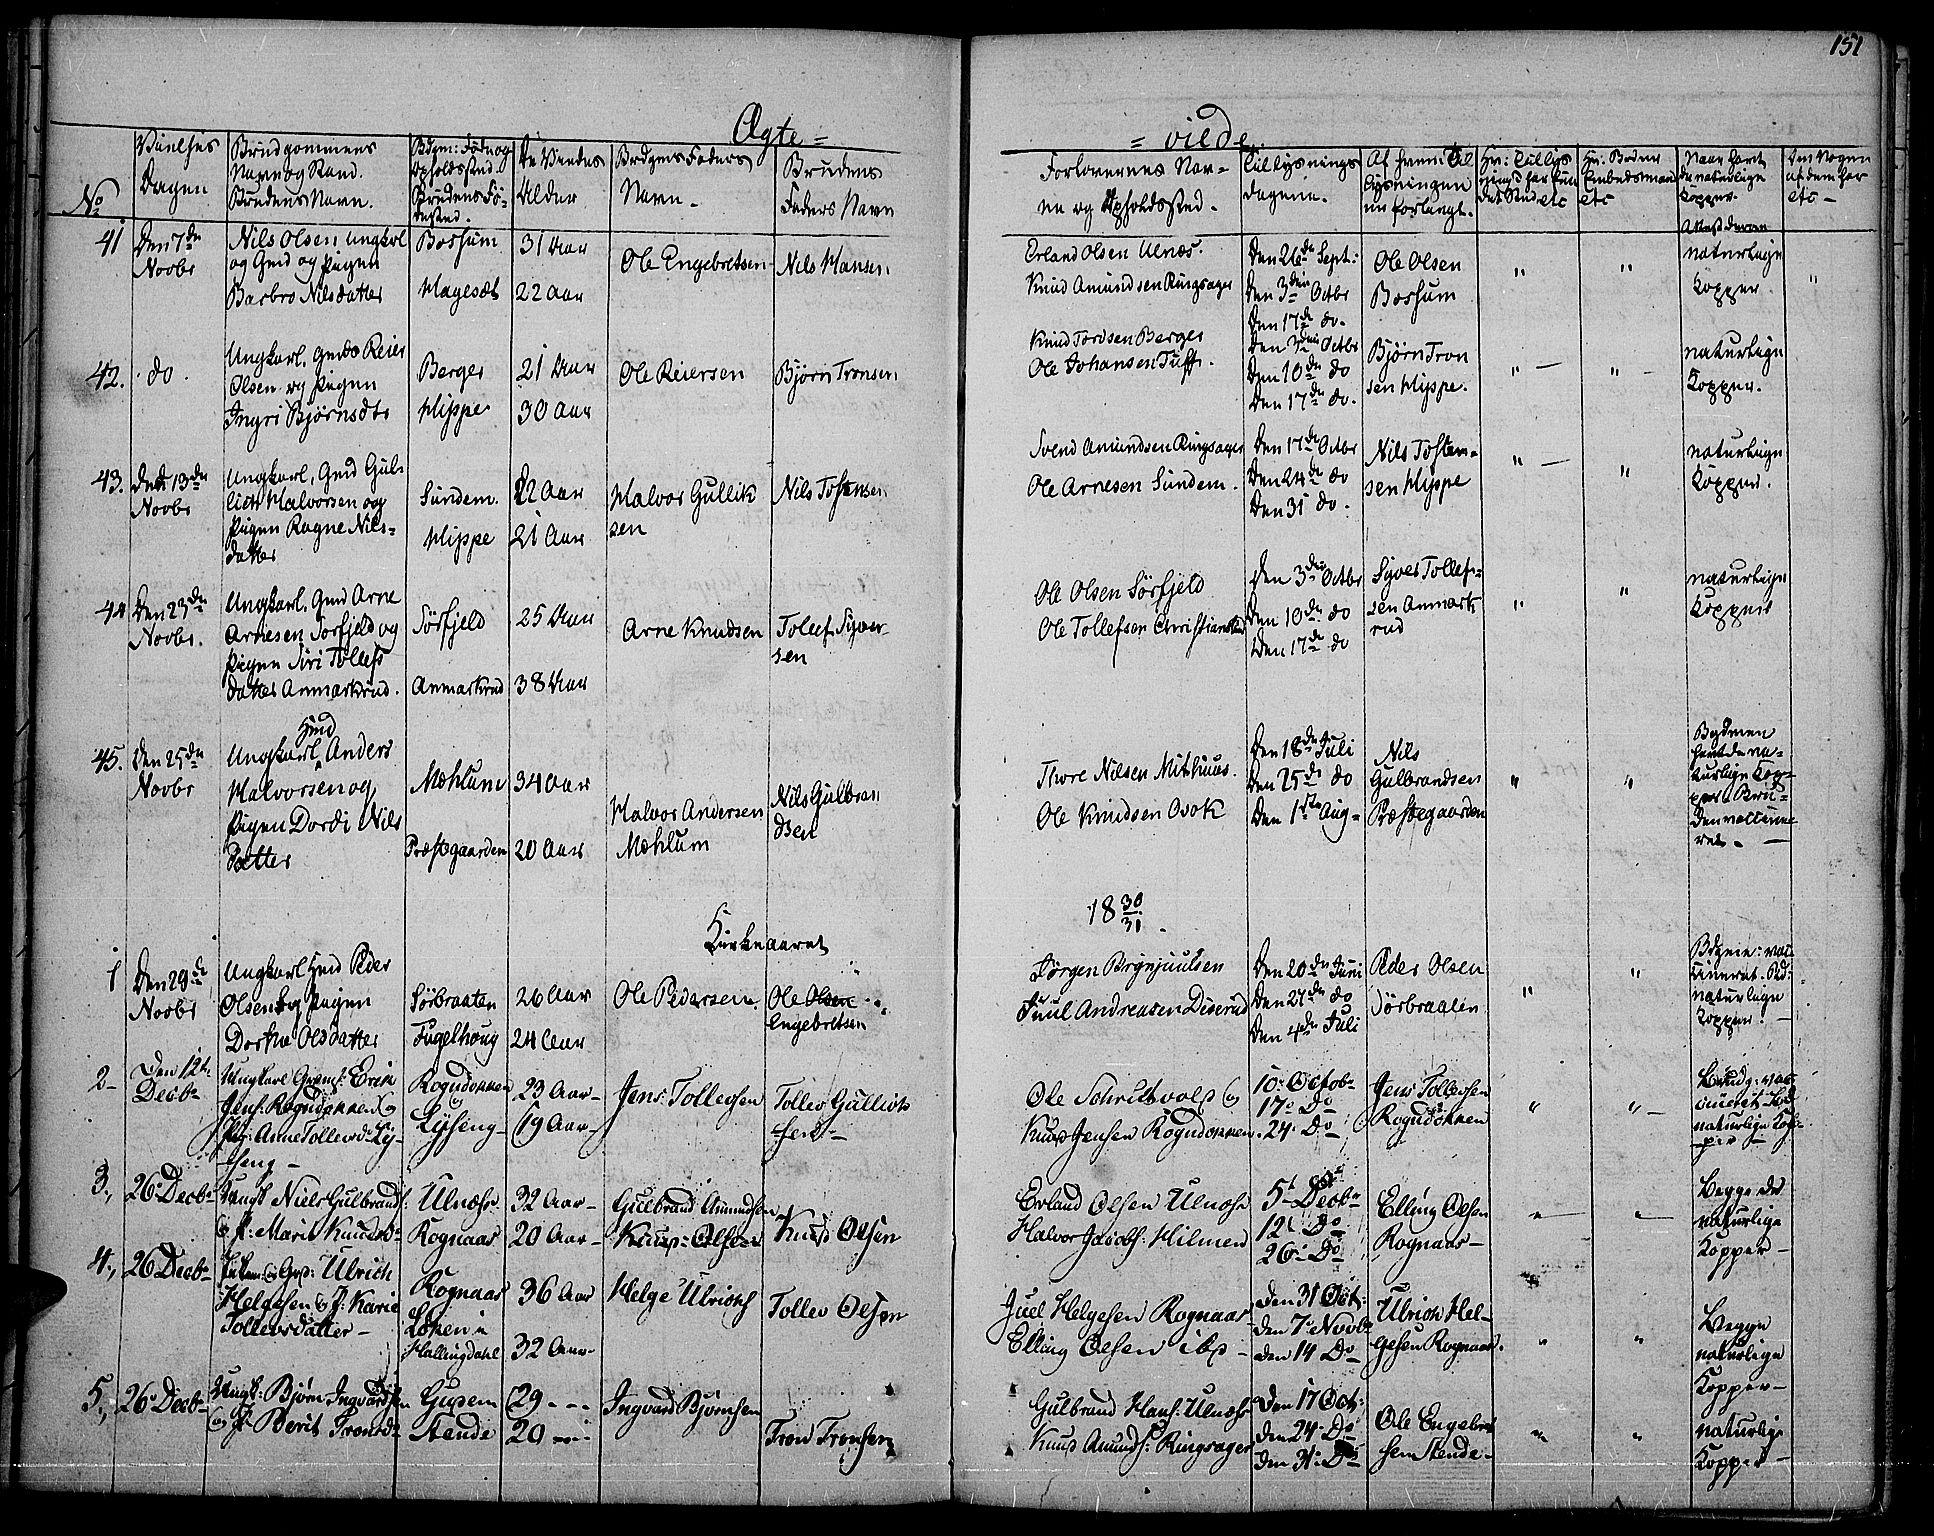 SAH, Nord-Aurdal prestekontor, Ministerialbok nr. 3, 1828-1841, s. 151